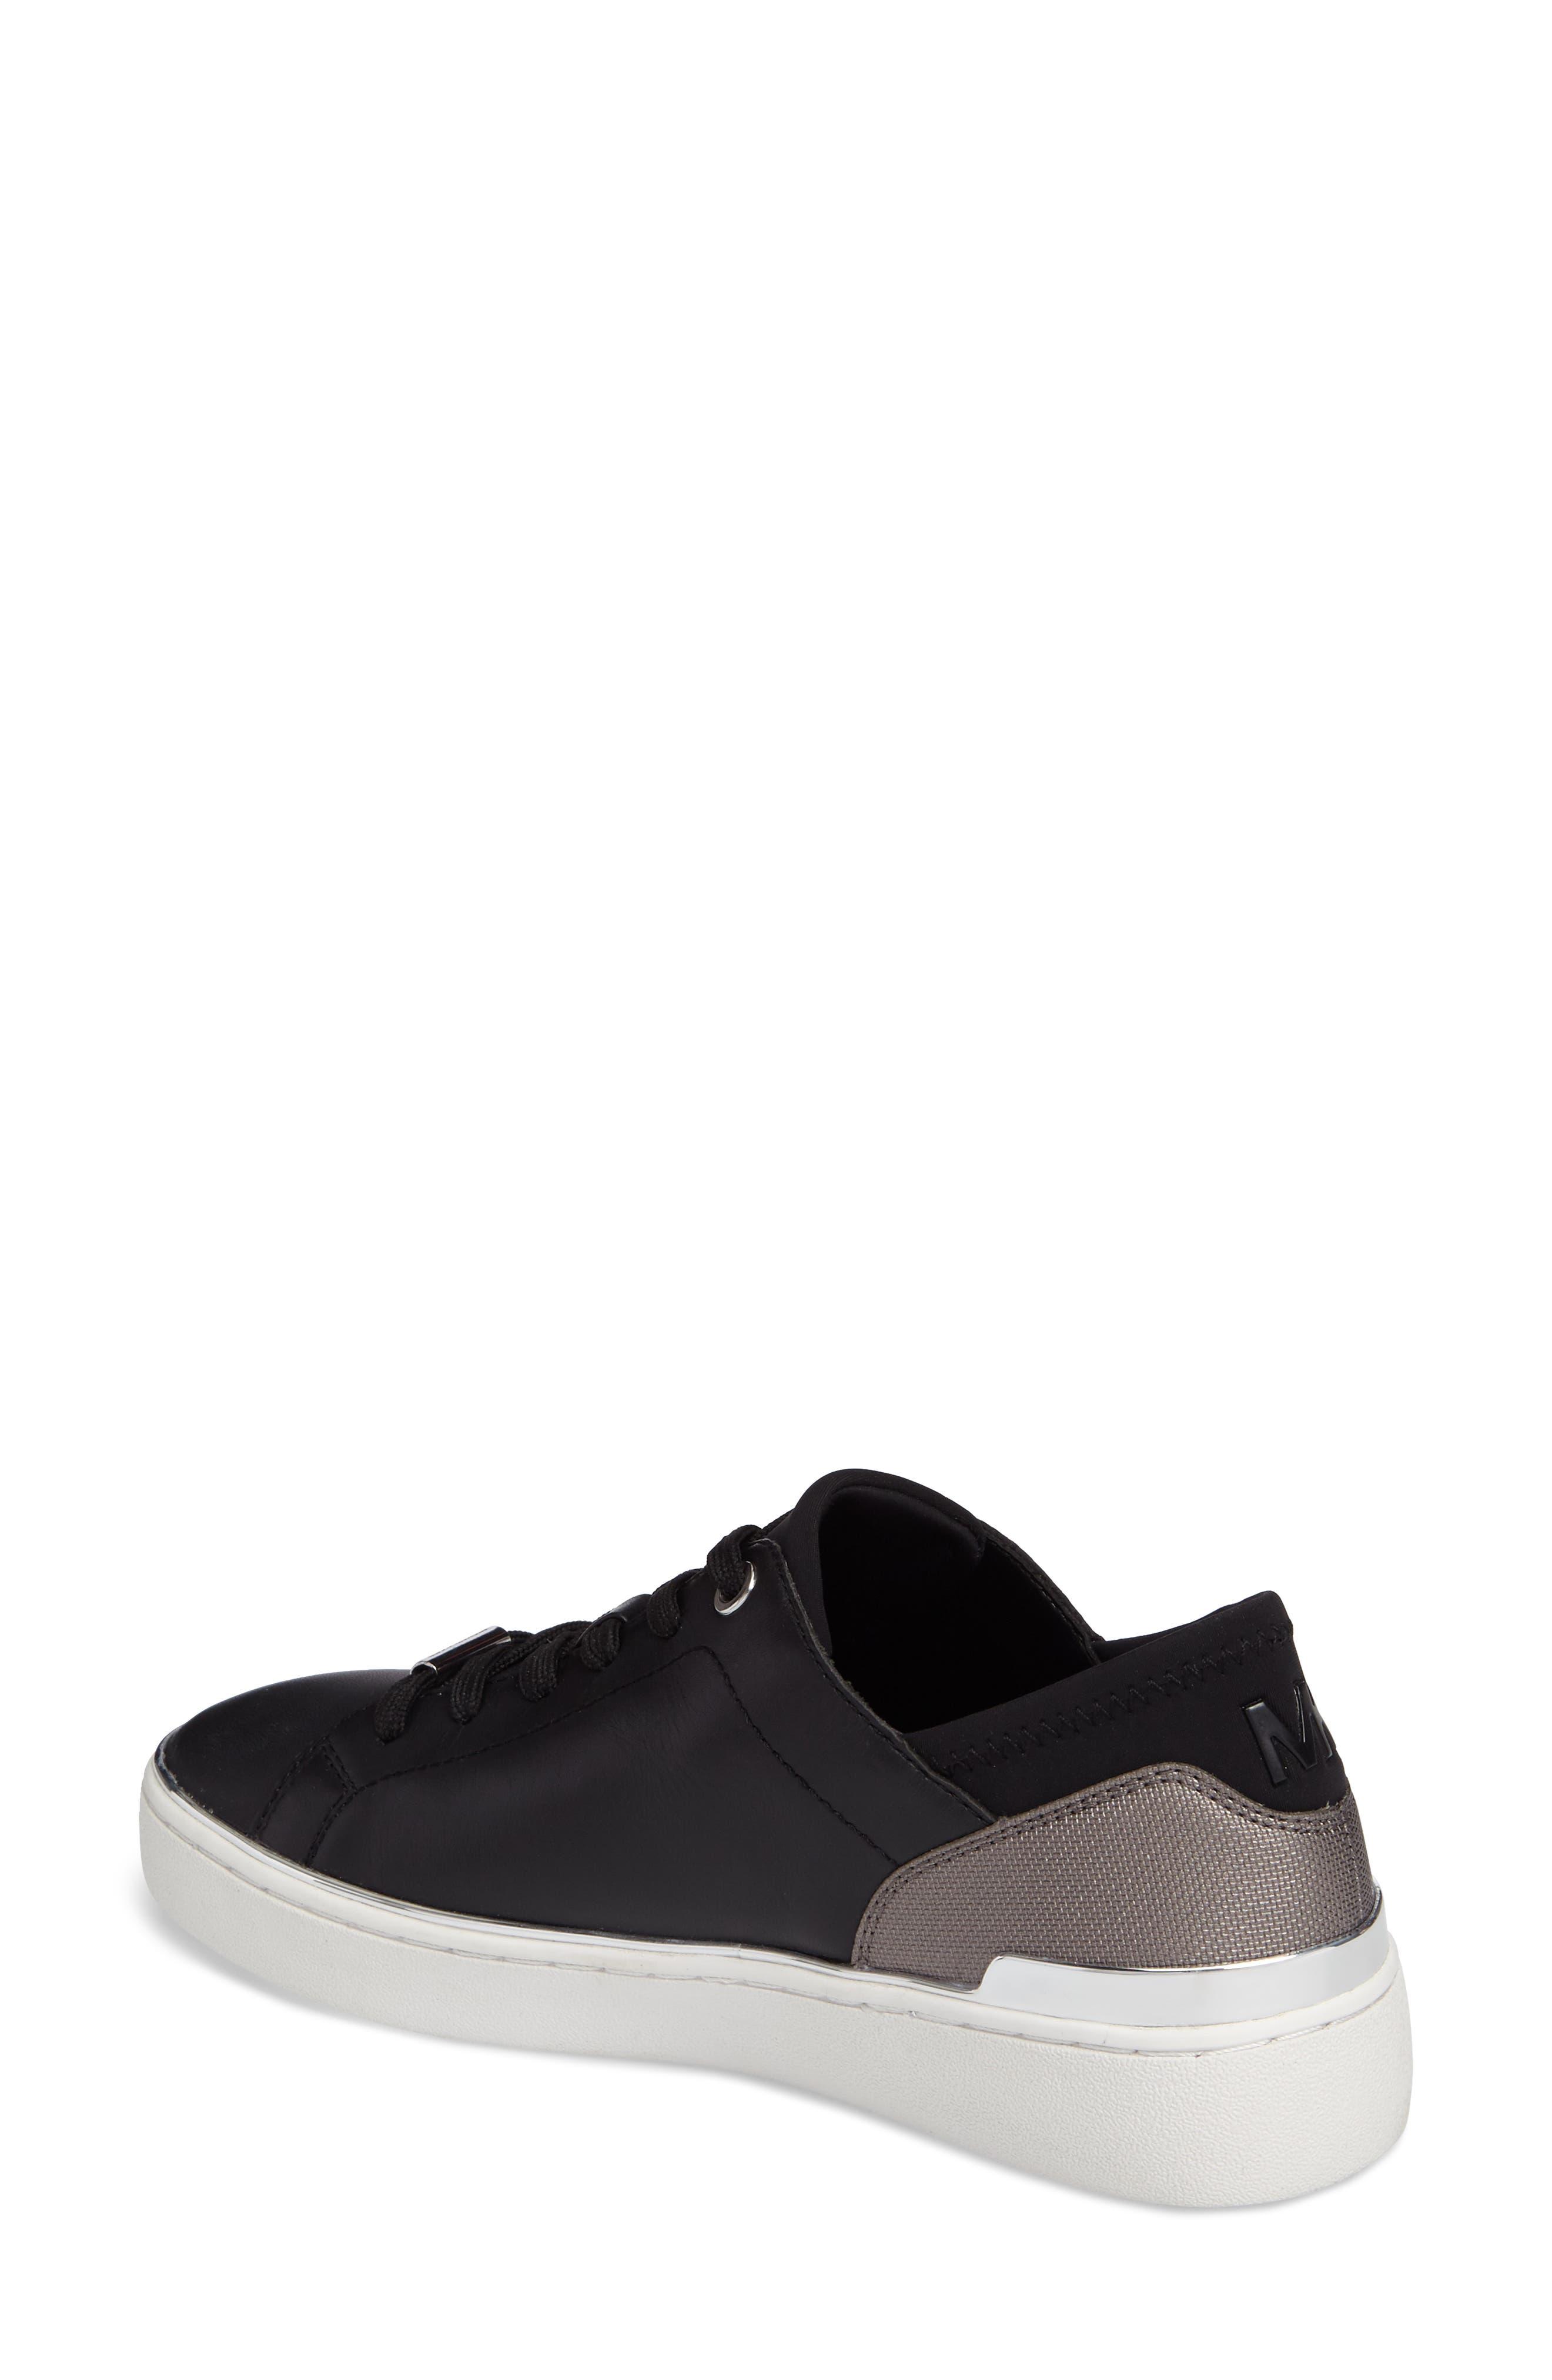 Scout Sneaker,                             Alternate thumbnail 2, color,                             002